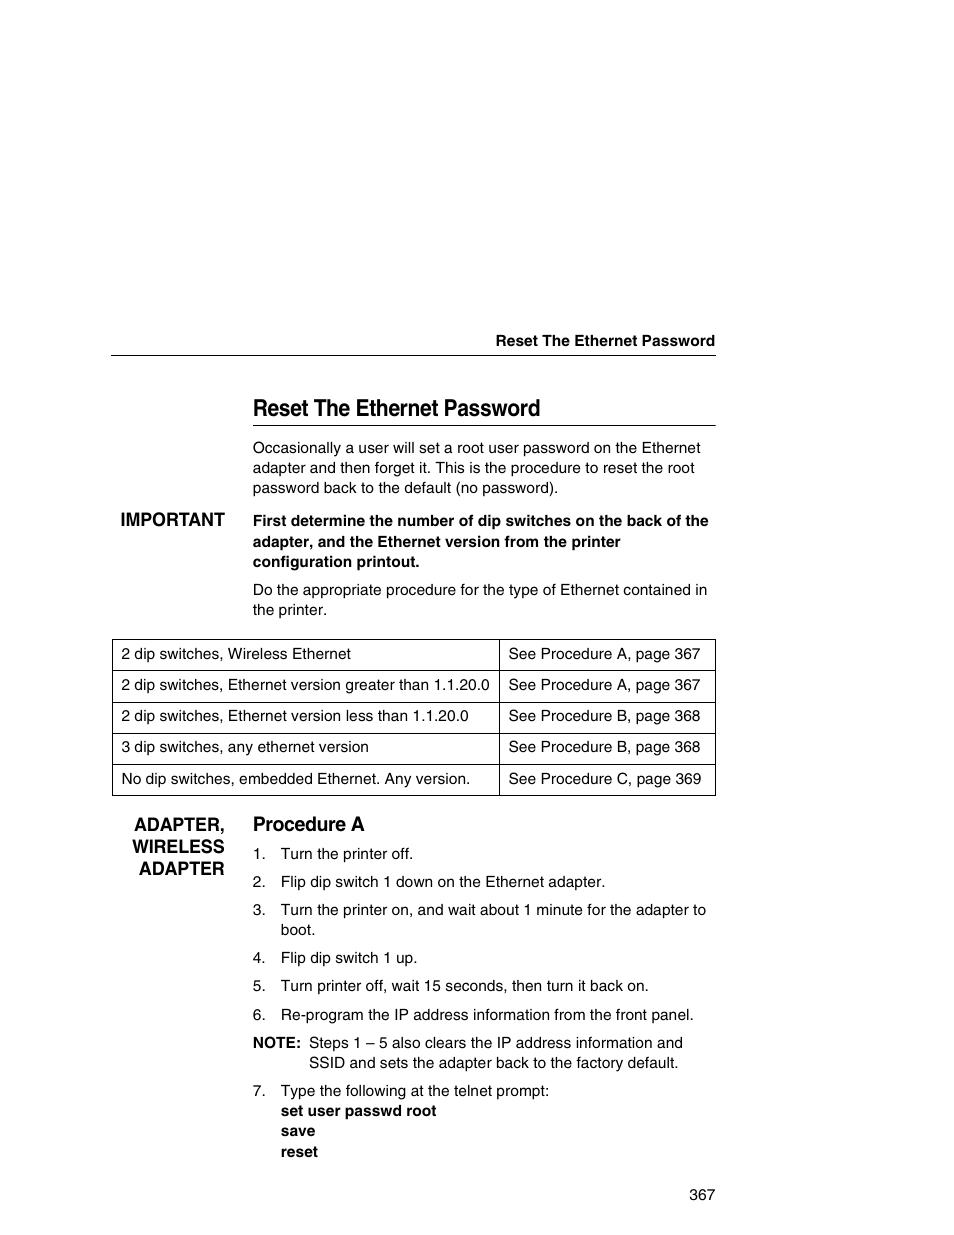 reset the ethernet password procedure a ibm infoprint 6500 user rh manualsdir com IBM 6500 V2.0 ibm infoprint 6500 user manual